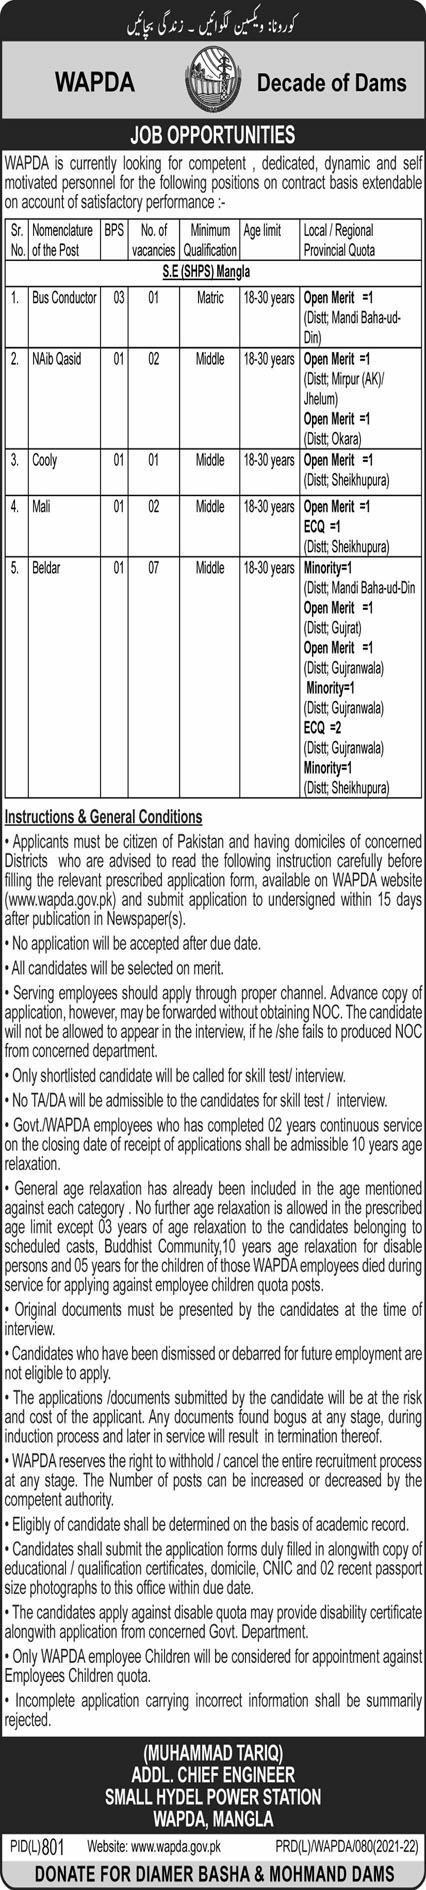 Wapda latest Jobs 2021 for Mangla Power Station